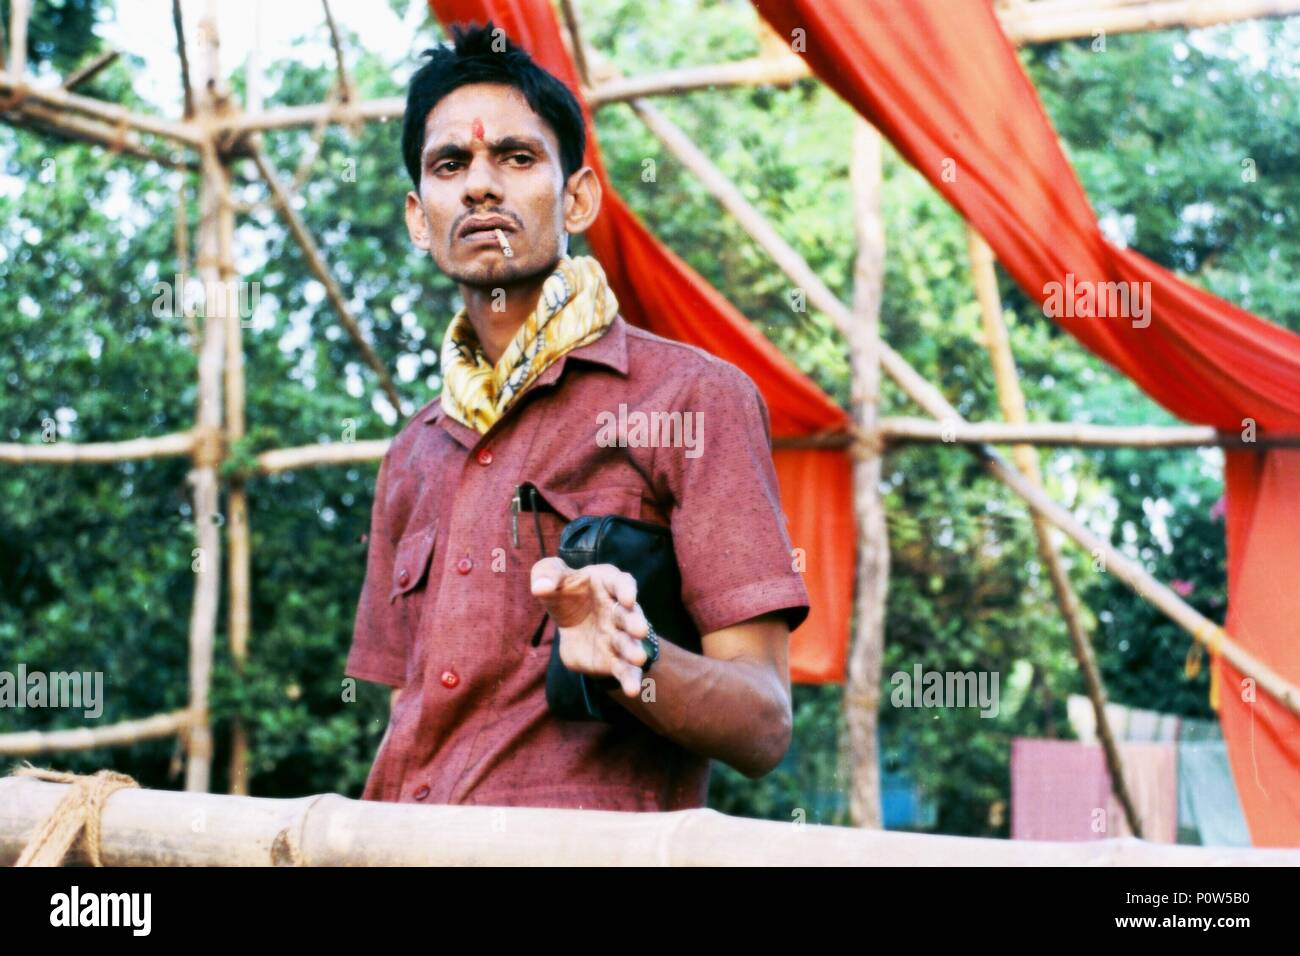 Vijay Raaz High Resolution Stock Photography and Images - Alamy